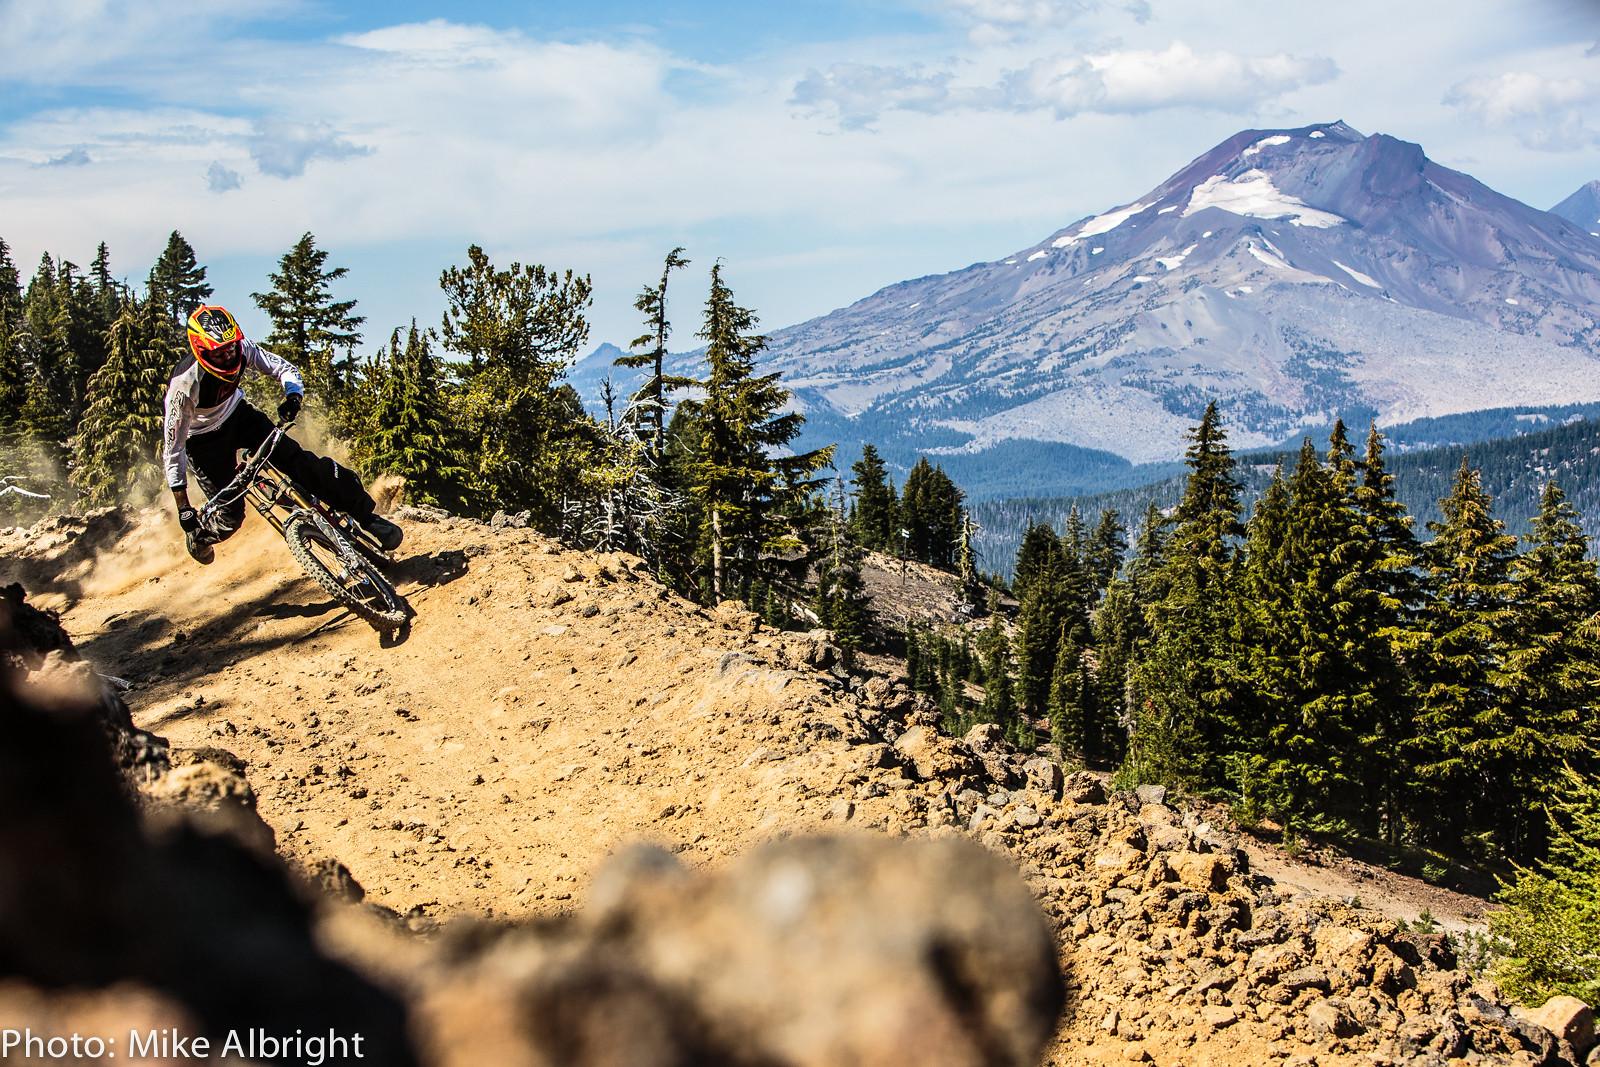 John Frey,Opening weekend for the new Mt. Bachelor Bike Park - bikesales - Mountain Biking Pictures - Vital MTB